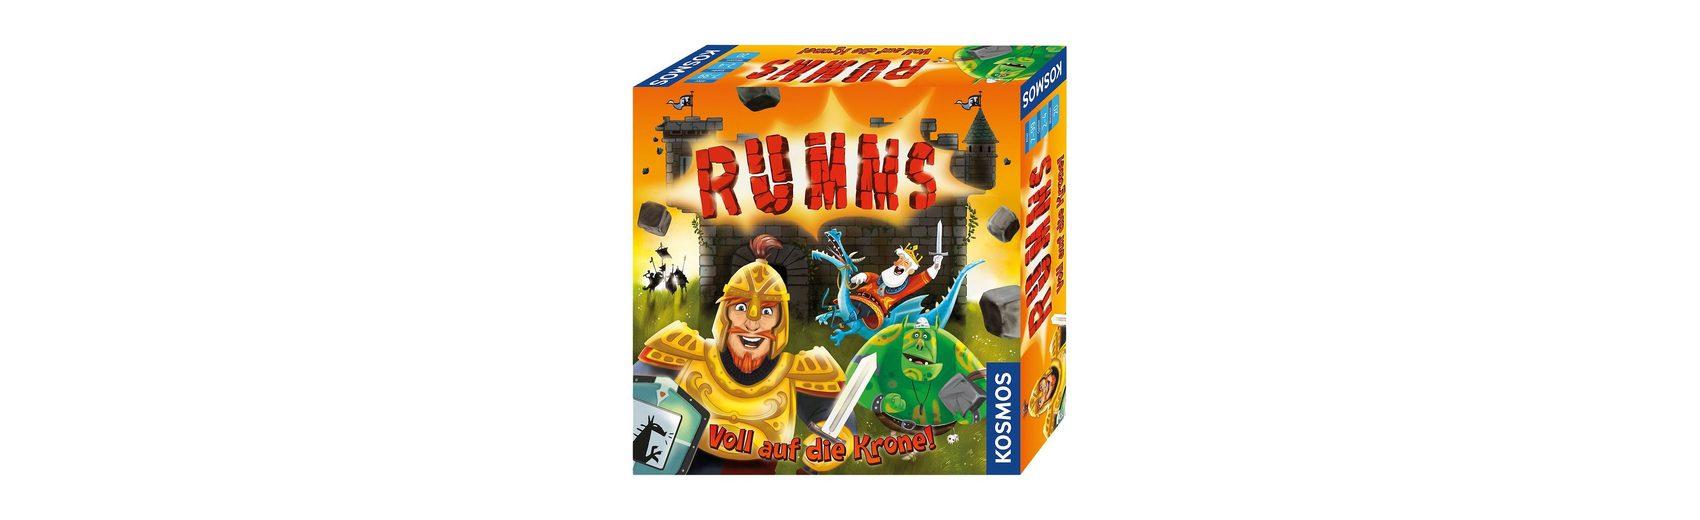 Kosmos Rumms - Voll auf die Krone!